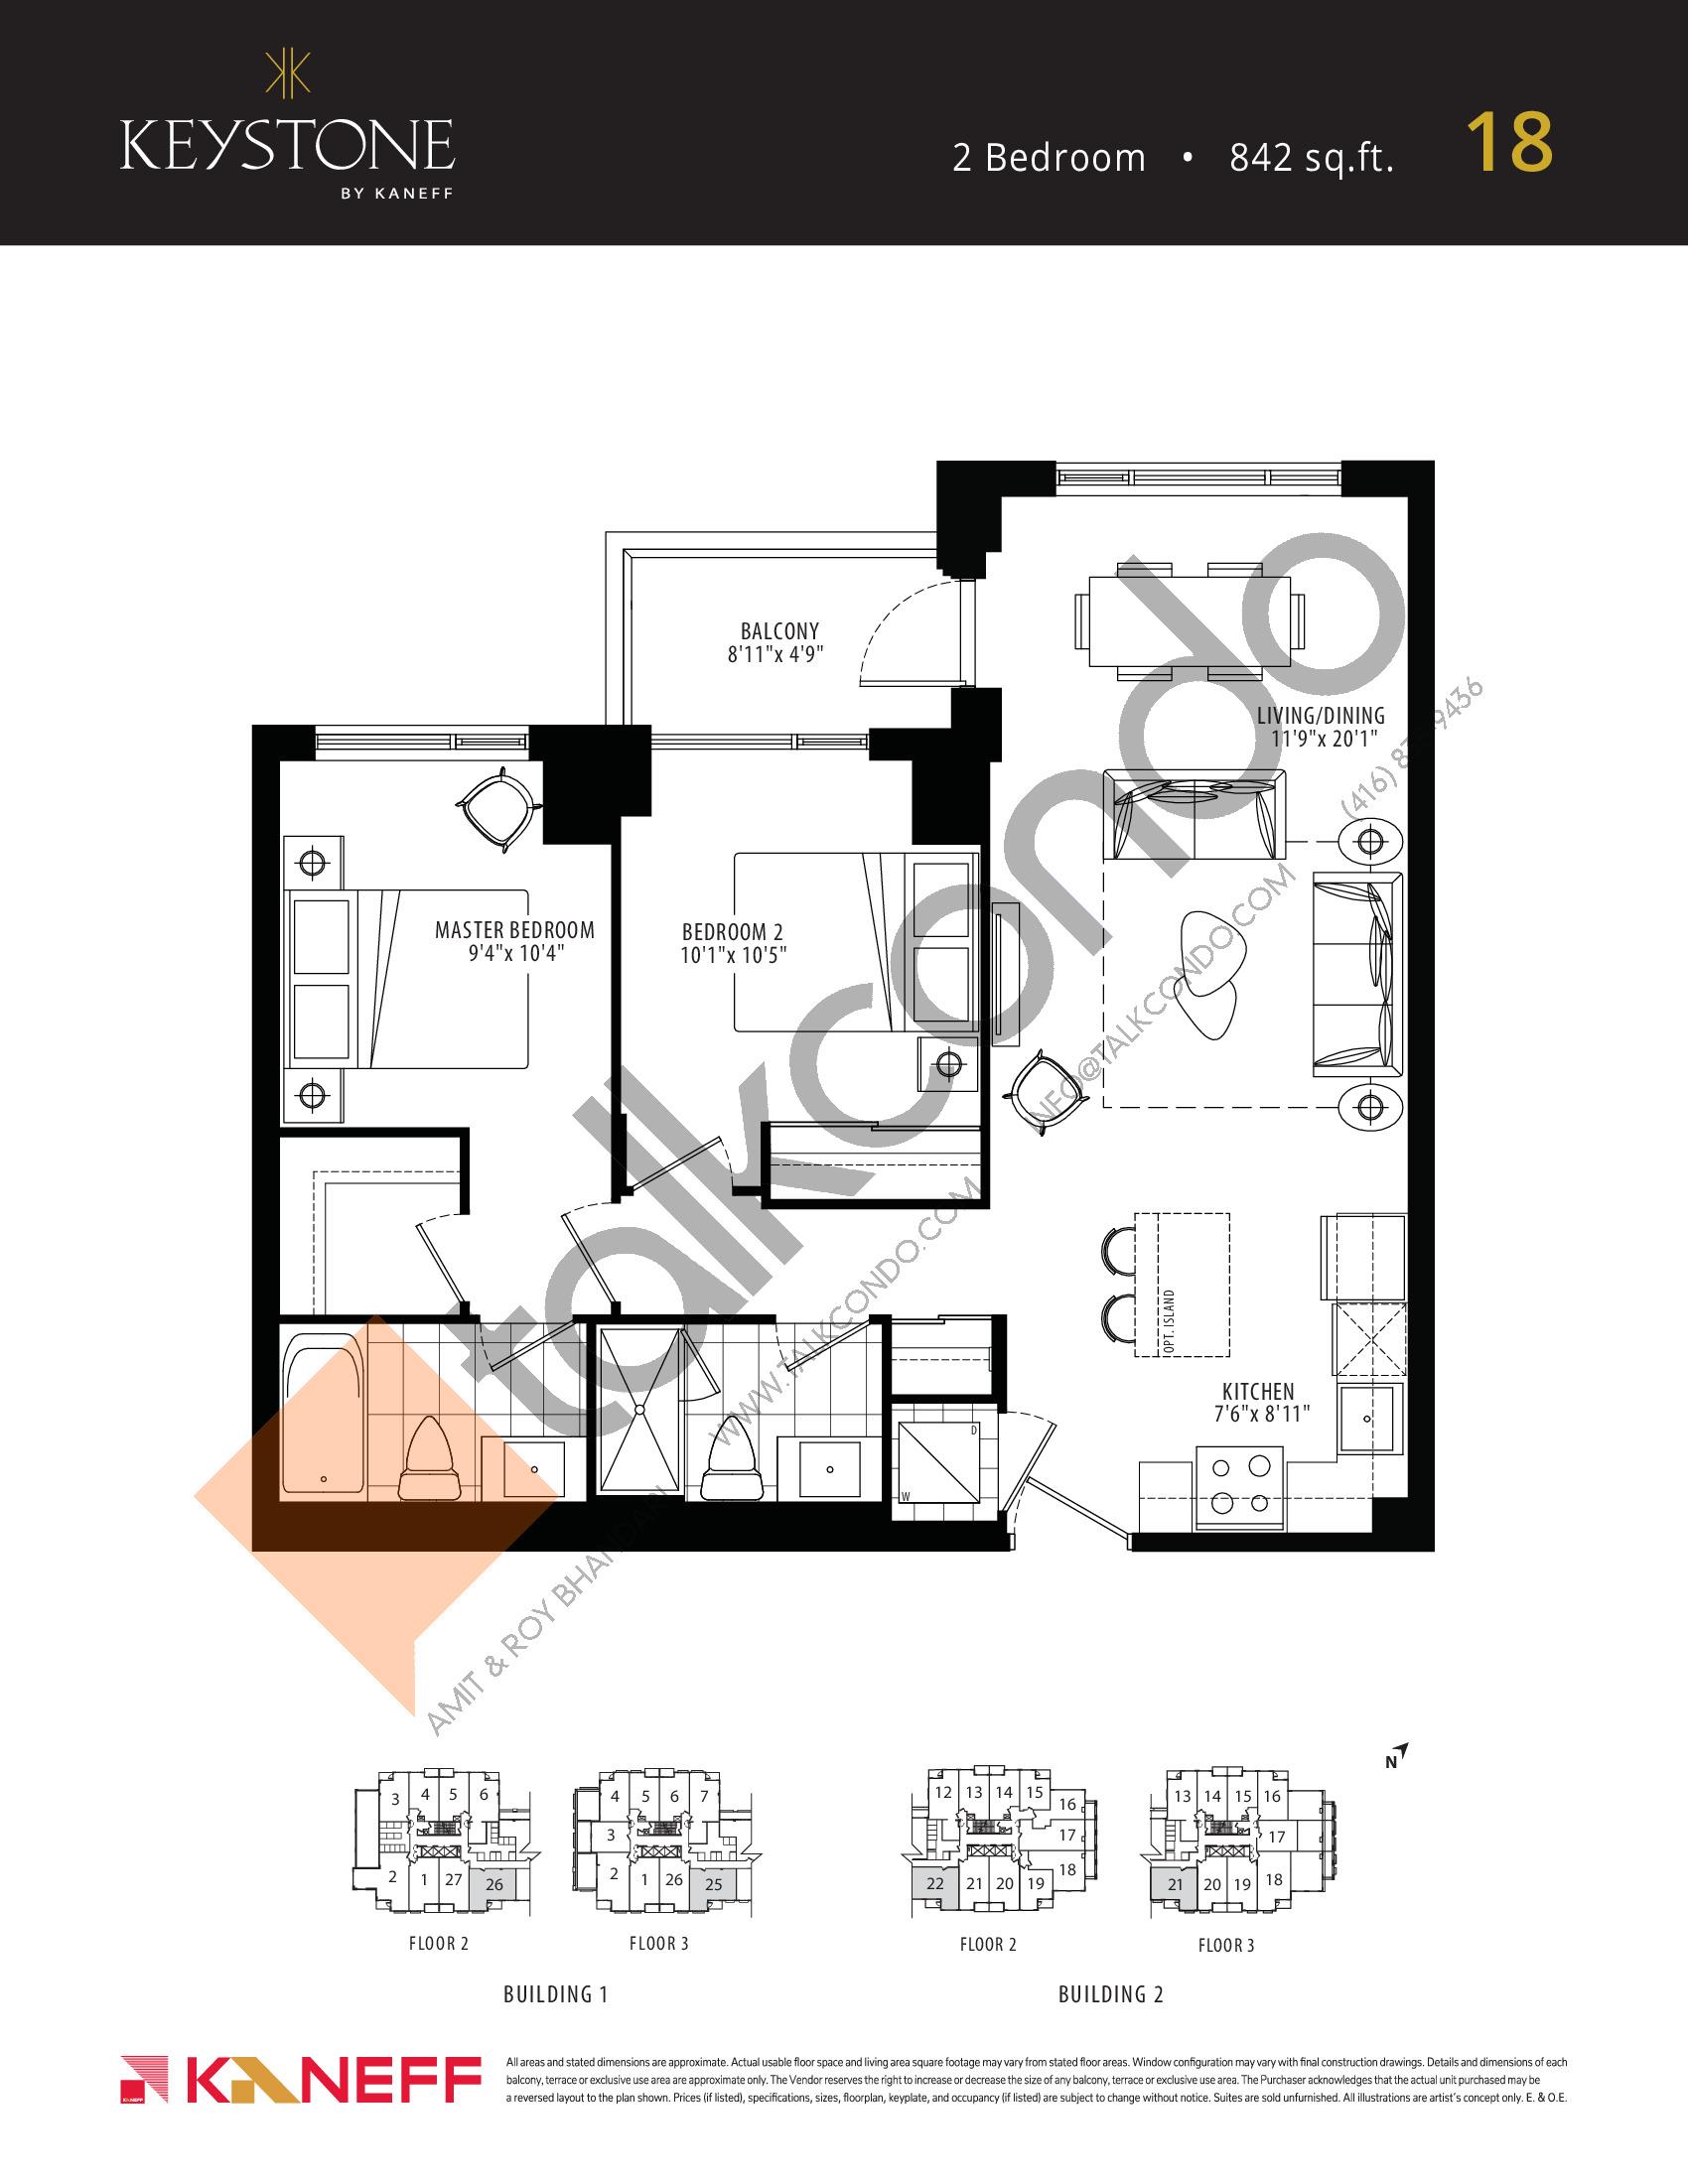 18 Floor Plan at Keystone Condos Phase 2 - 842 sq.ft